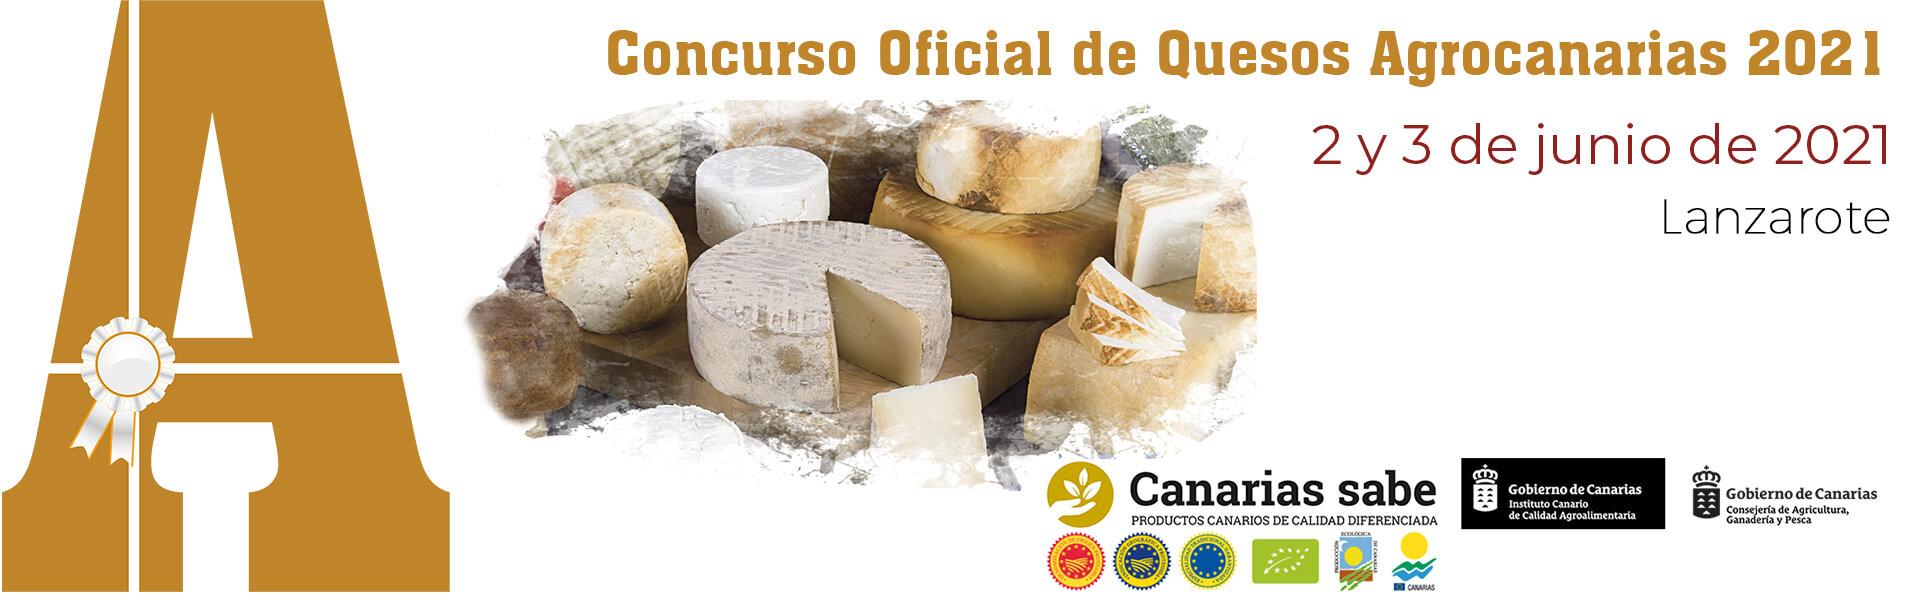 Concurso Oficial de Quesos Agrocanarias 2021